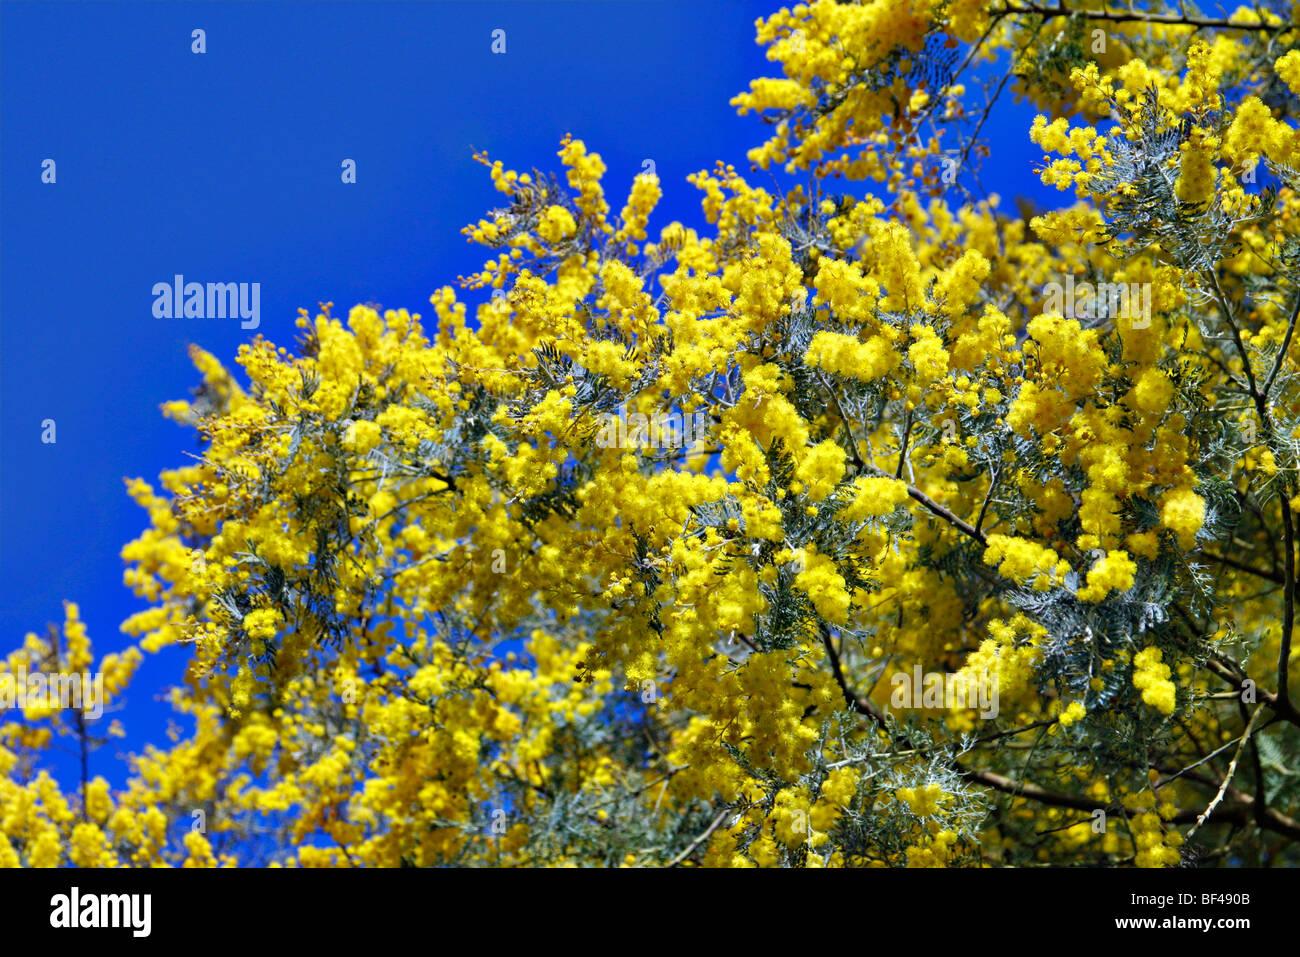 Acacia Dealbata Subalpina At Rhs Garden Rosemoor Stock Photo